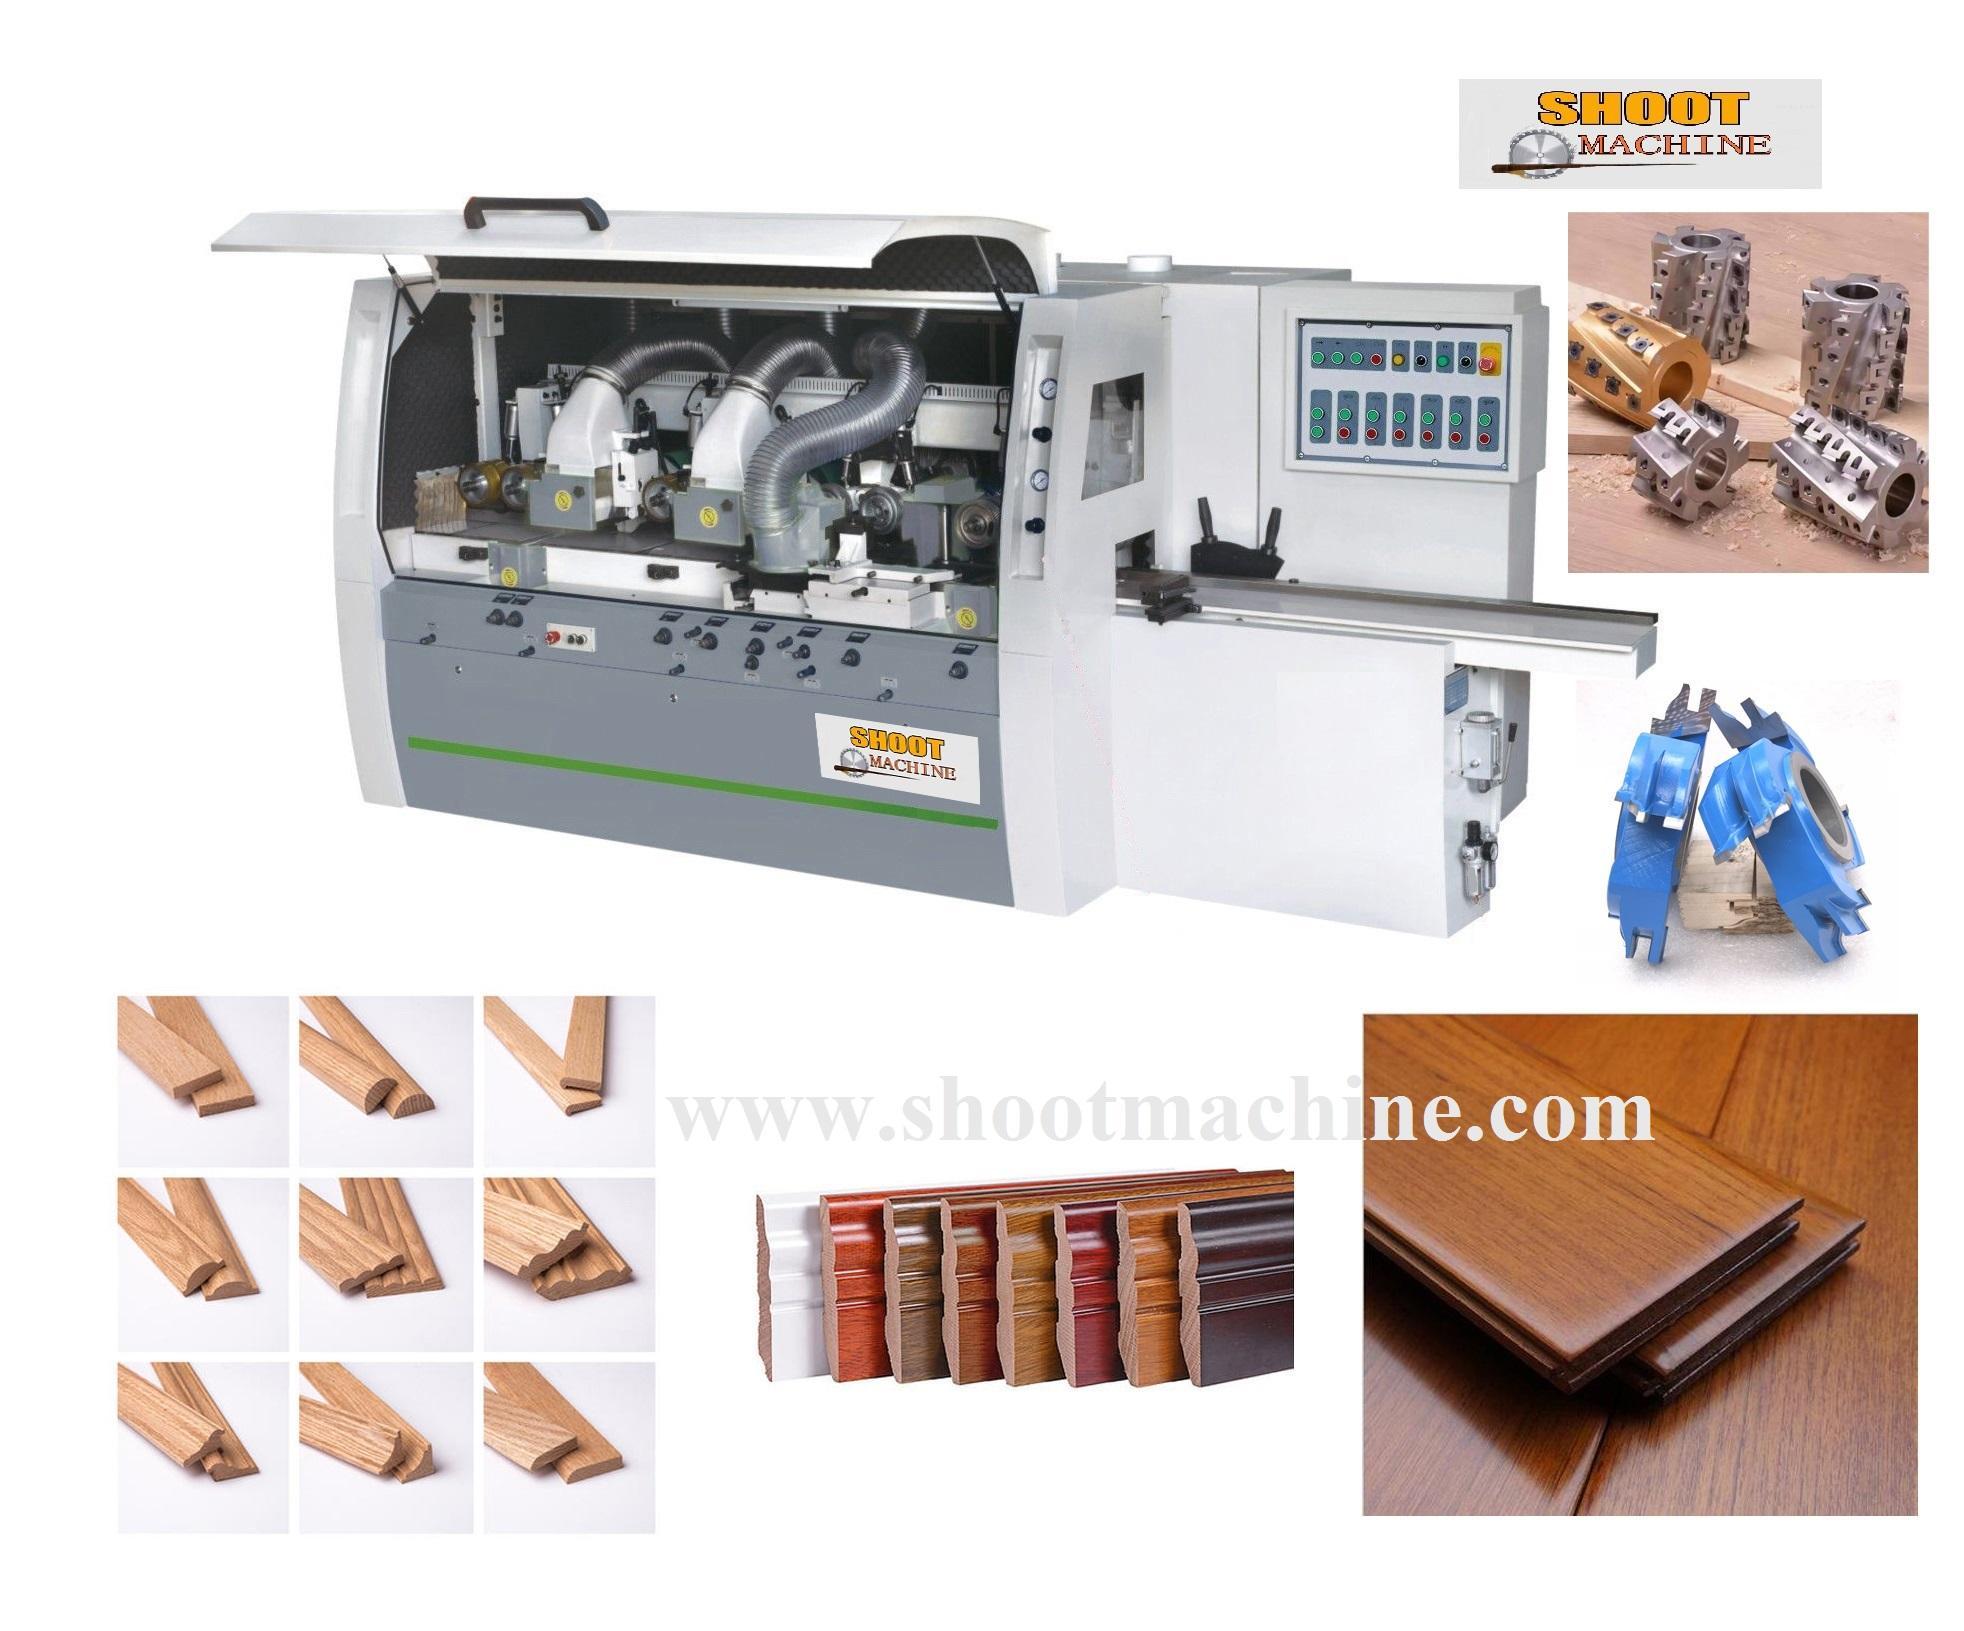 SHOOT Brand Woodworking Four side Moulder Machine,SHXM620